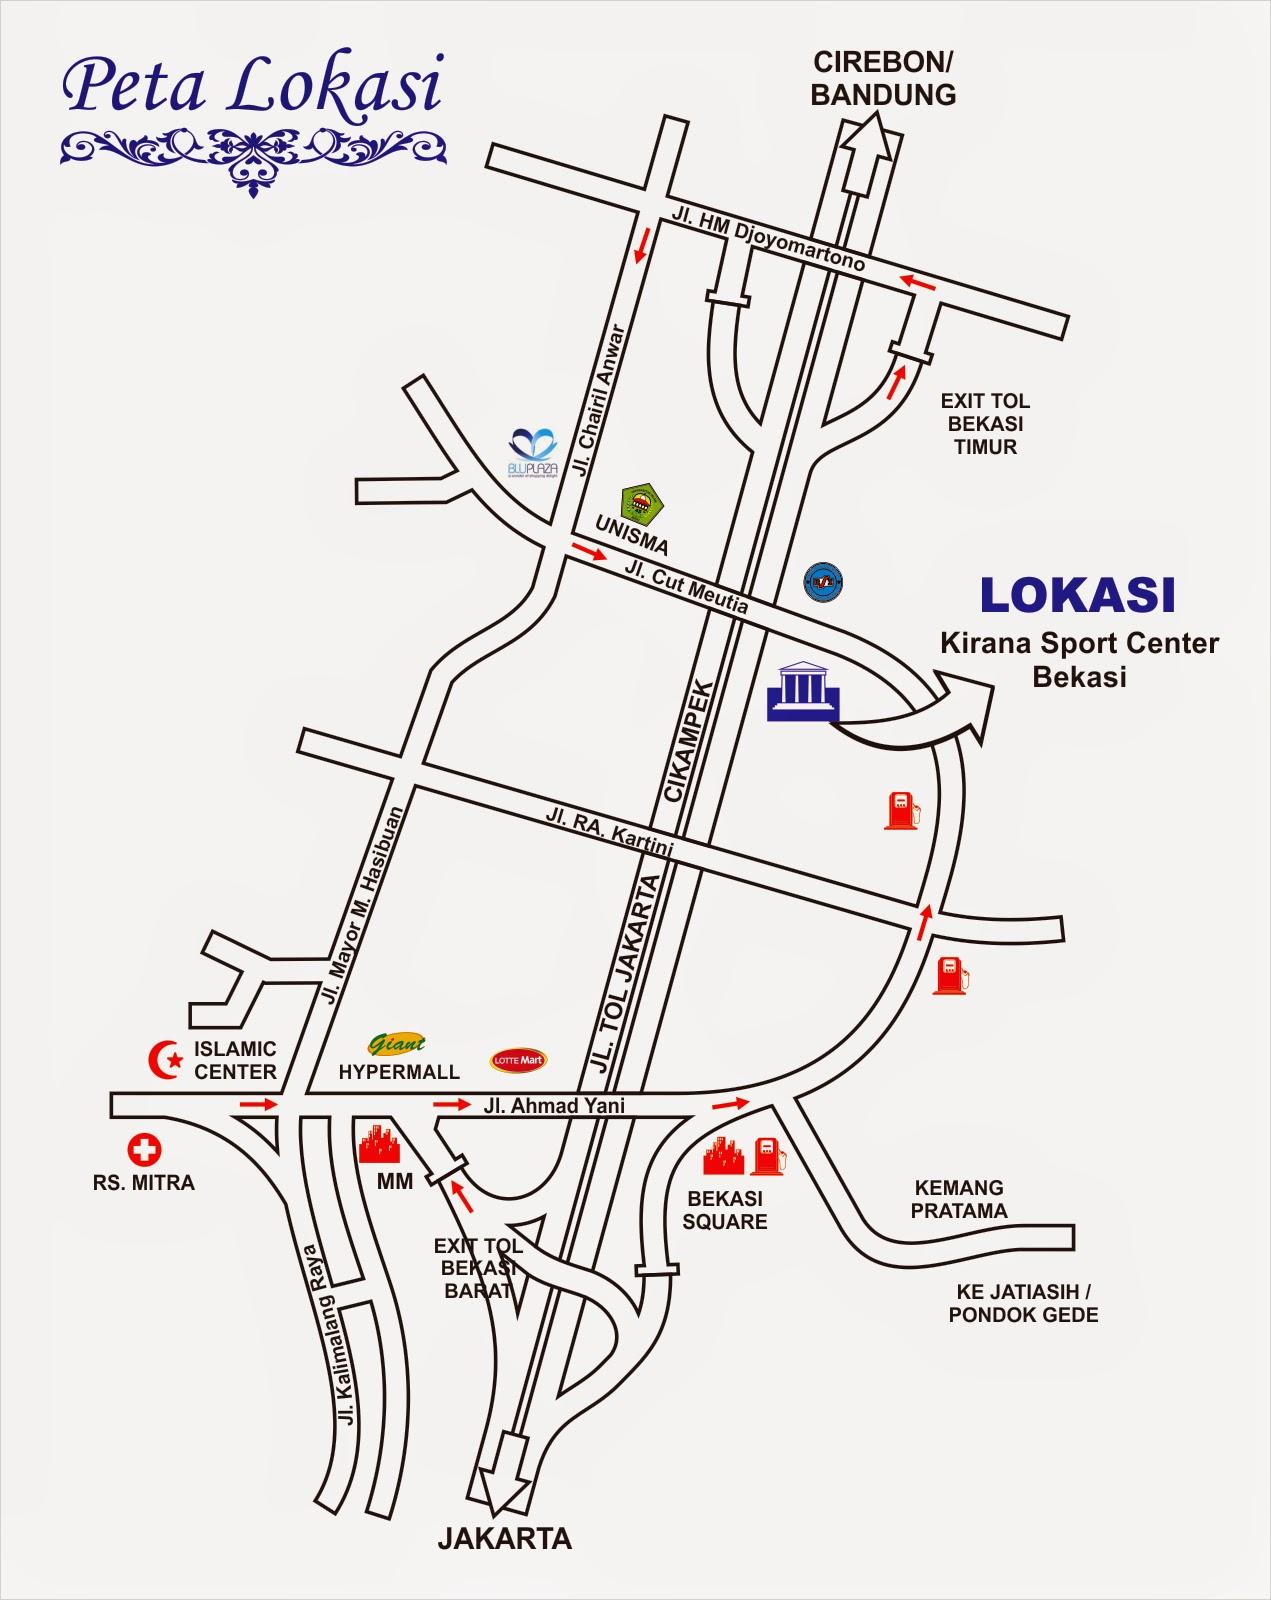 Denah Kirana Sport Center - Bekasi